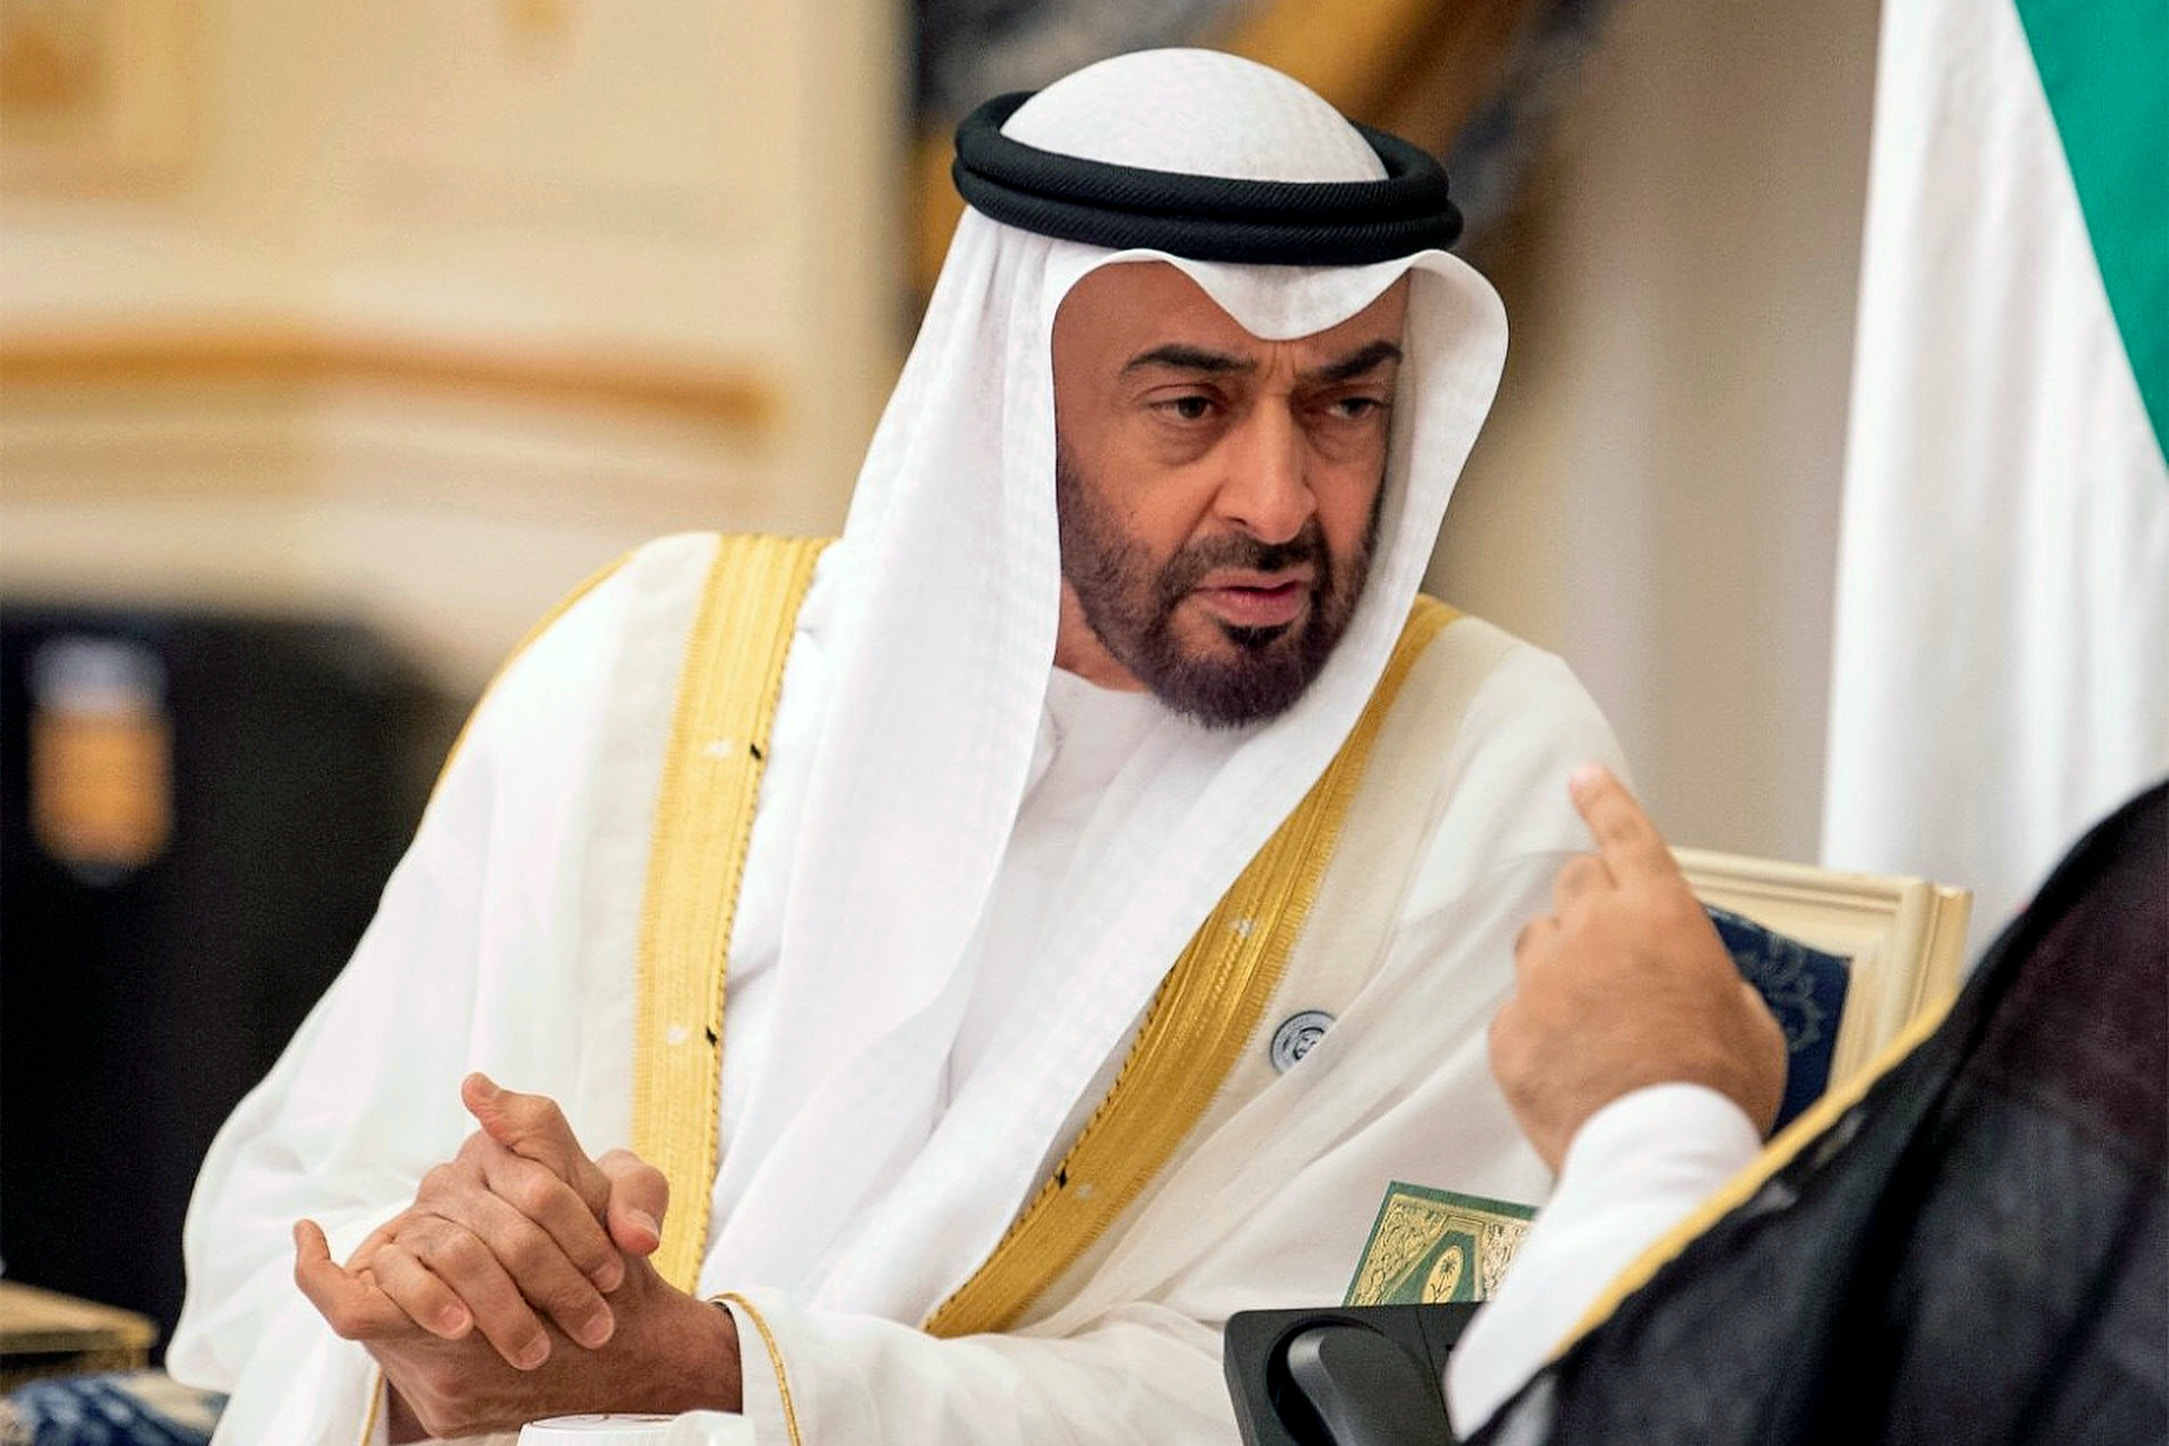 Saudi Crown Prince Mohammed bin Salman bin Abdulaziz Al Saud (known as MBS, not pictured in this photo) receives Abu Dhabi's Crown Prince Sheikh Mohammed bin Zayed Al Nahyan (known as MBZ) in Jeddah on June 6, 2018. Photo by Balkis Press/Abaca/Sipa USA(Sipa via AP Images)